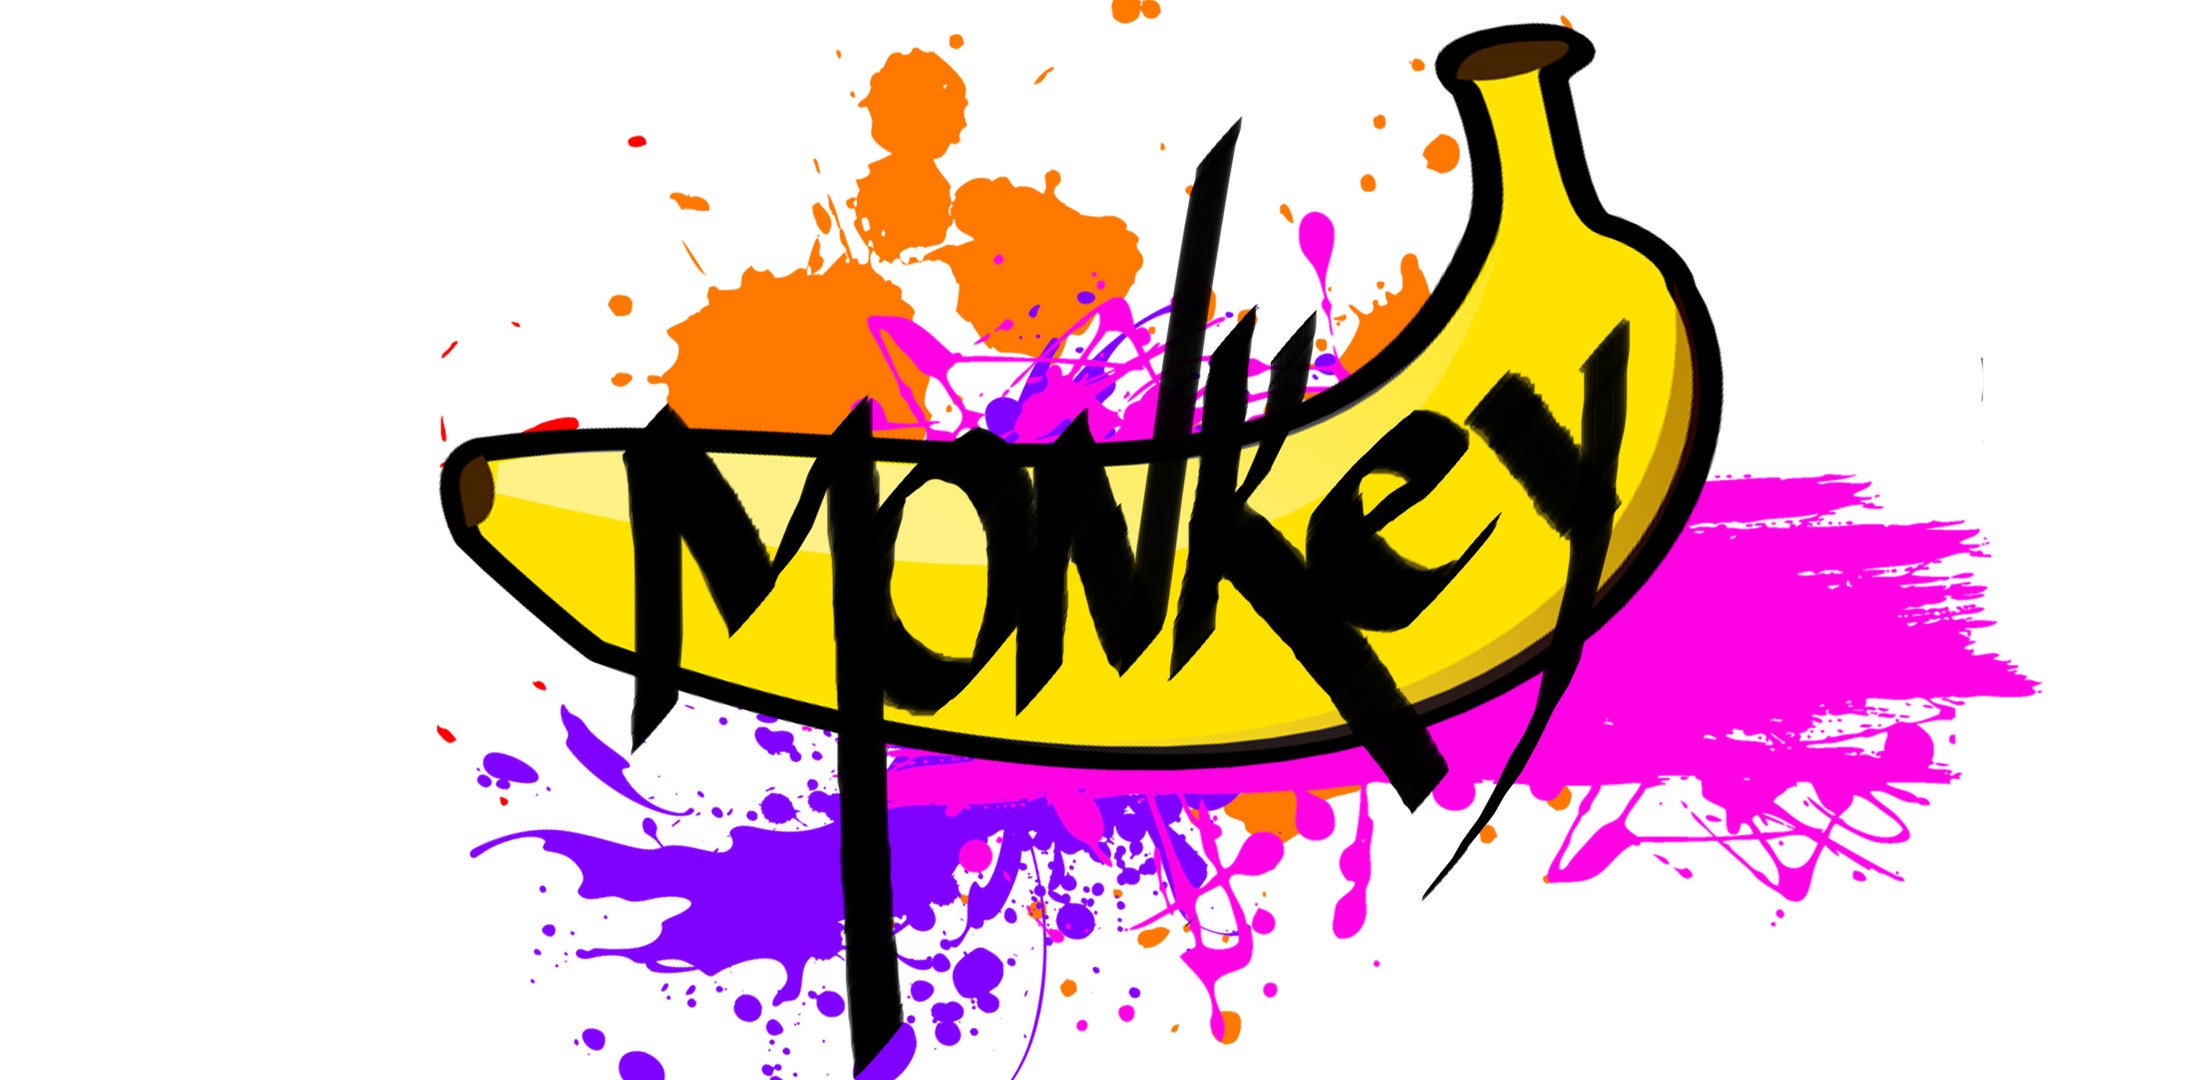 Monkey in Quarantine